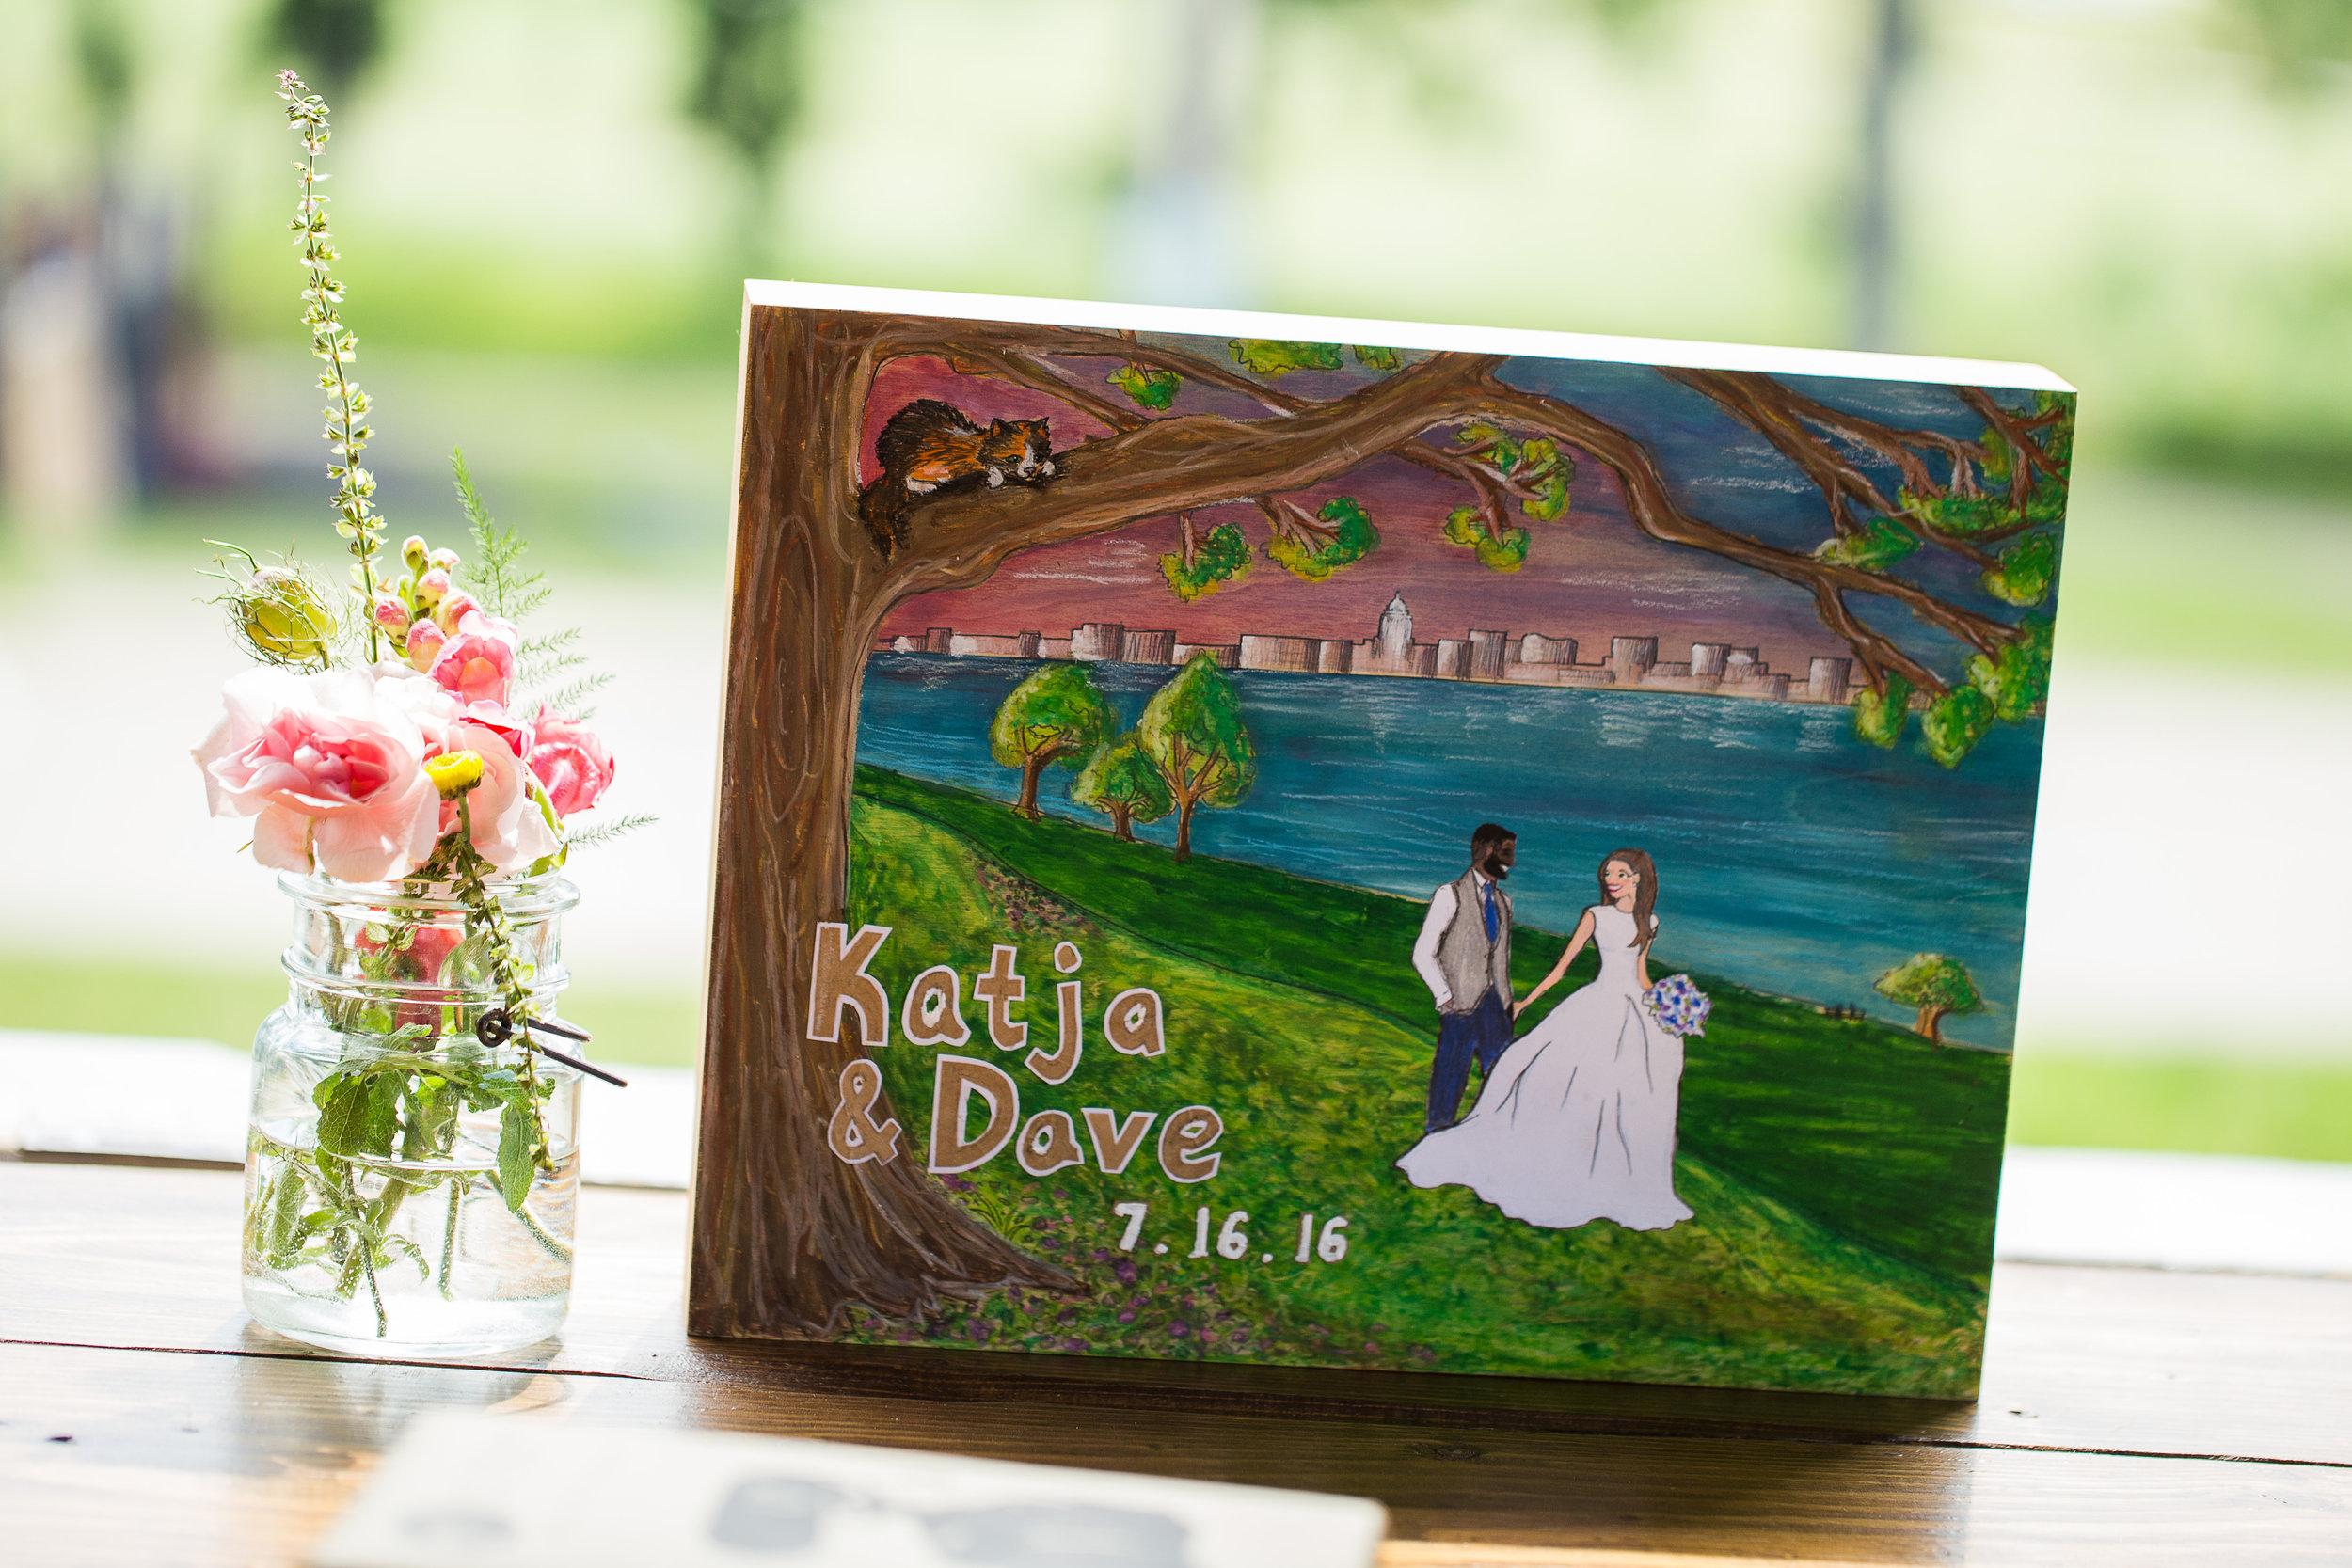 Dave-Katja-Wedding-232.jpg